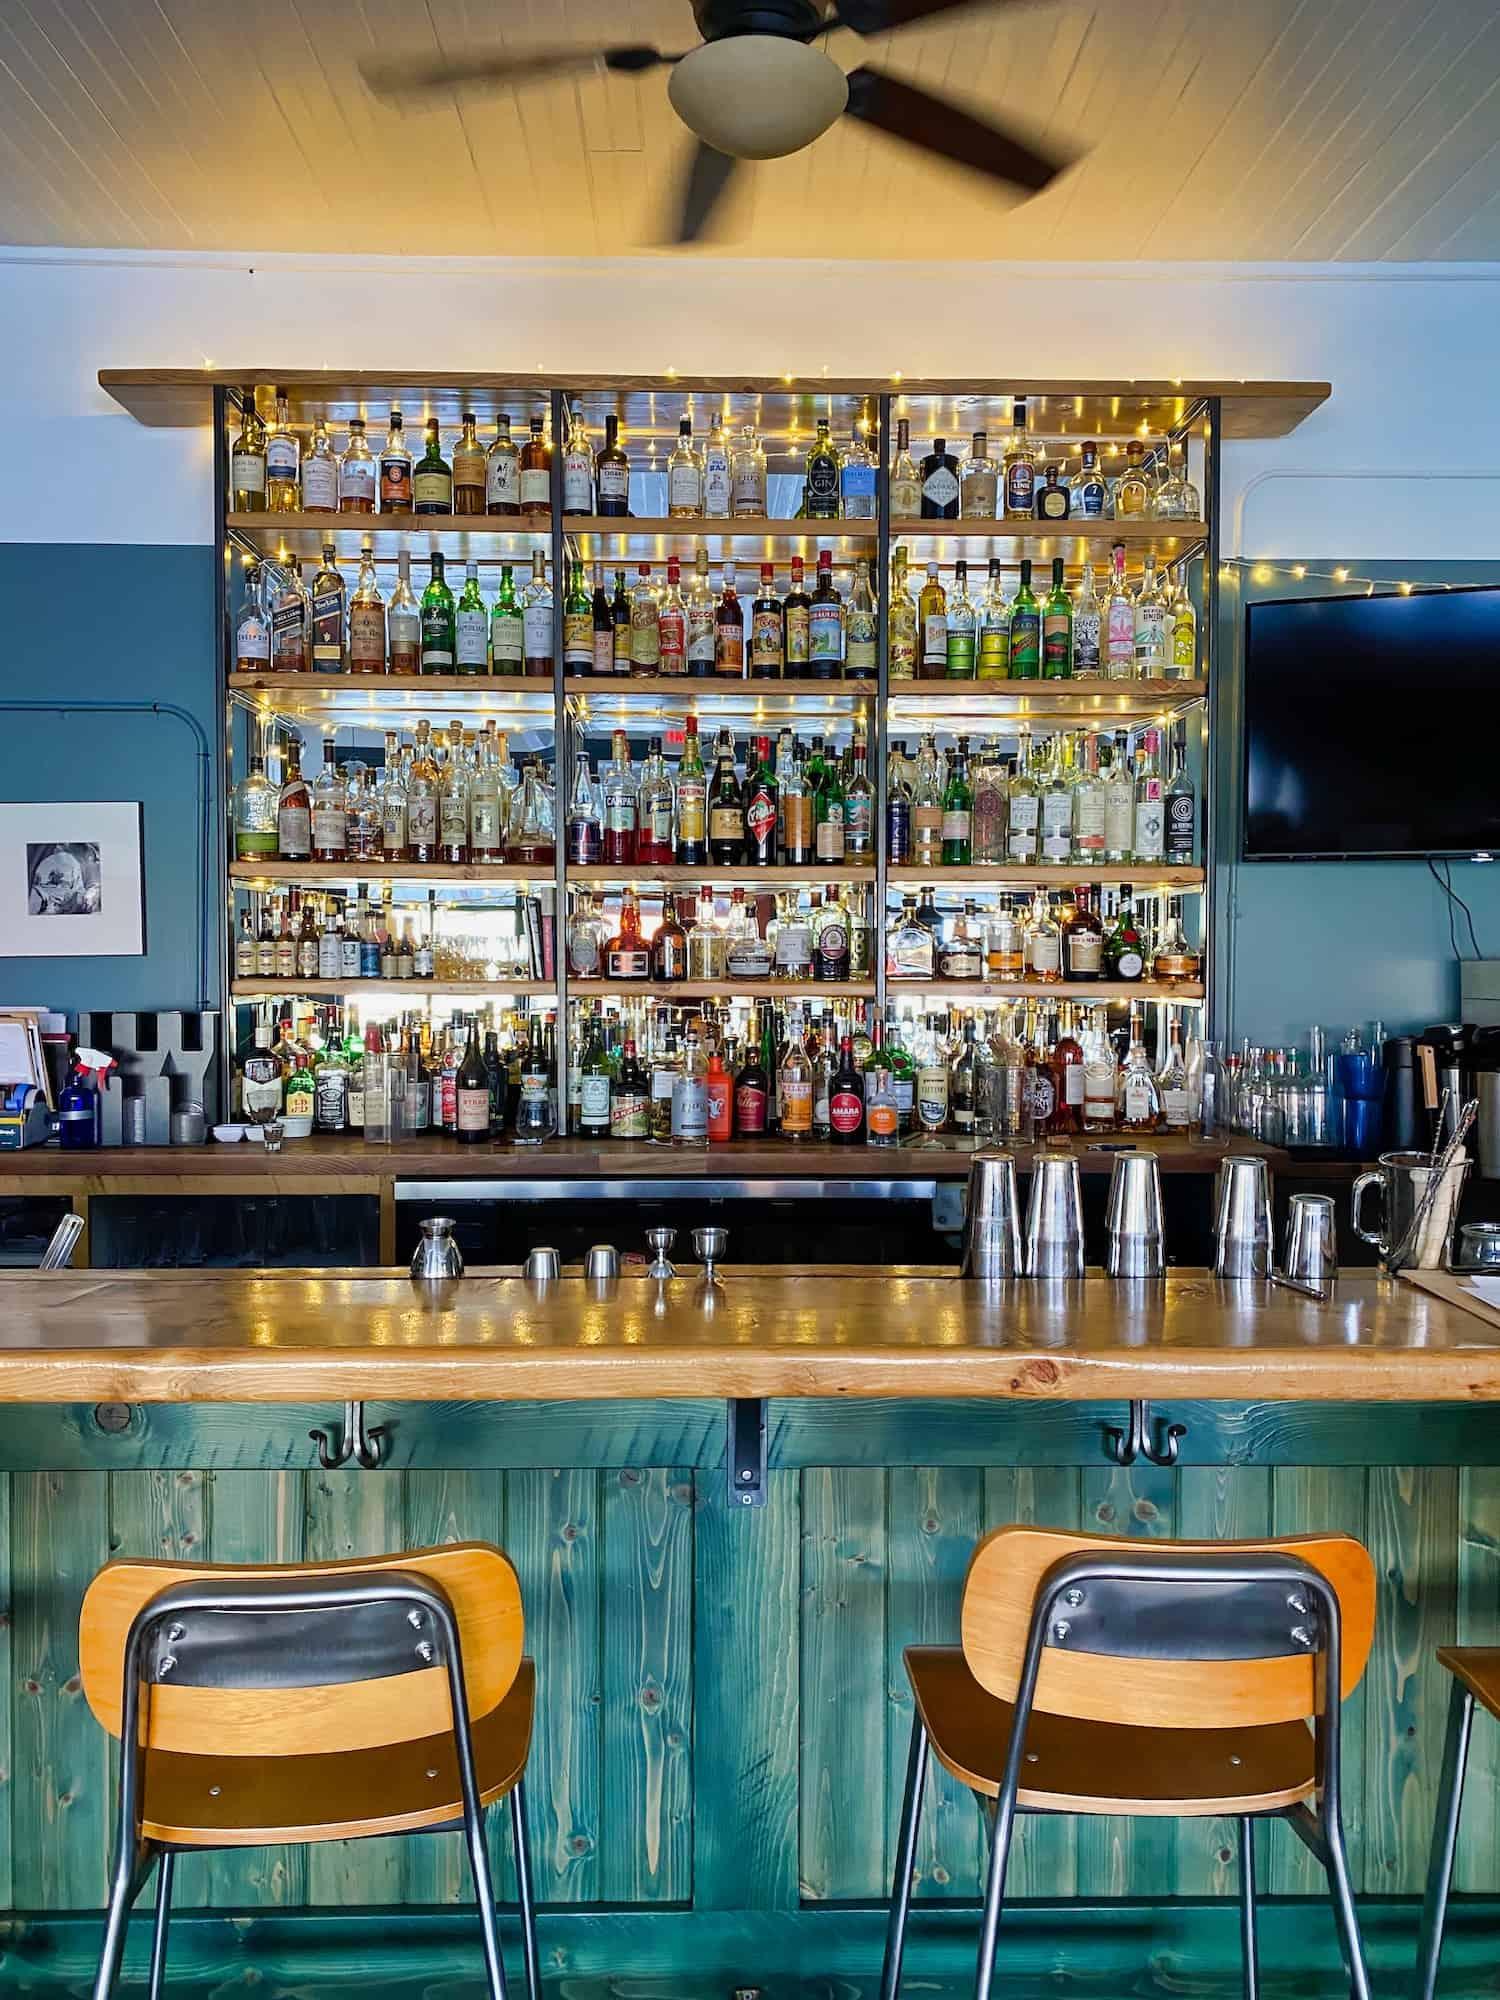 Great Basin National Park - Stargazer Inn Bar